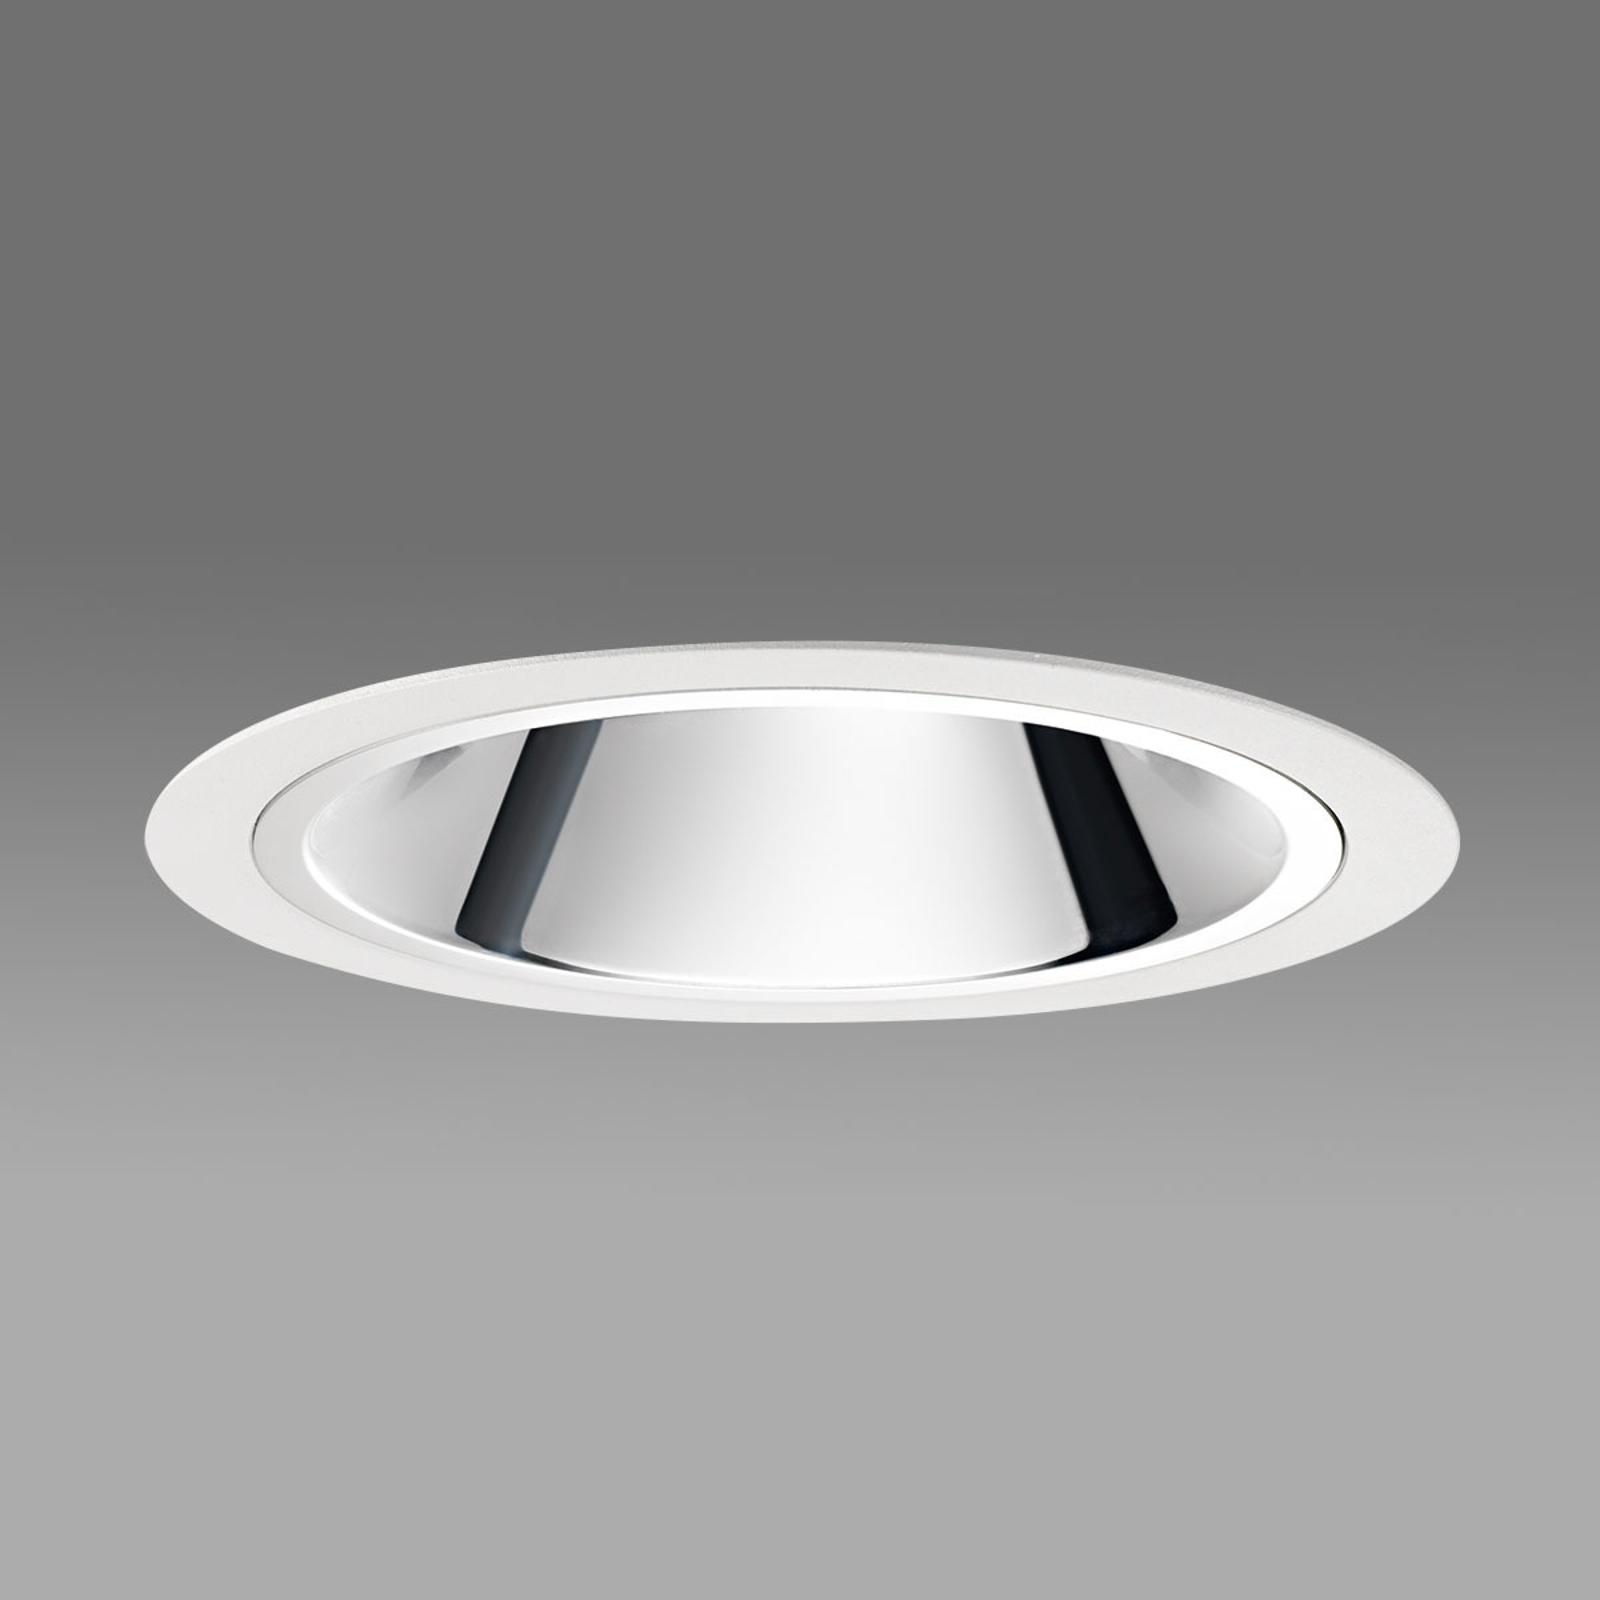 Acquista Lampada LED da incasso Centro - emissione 69°